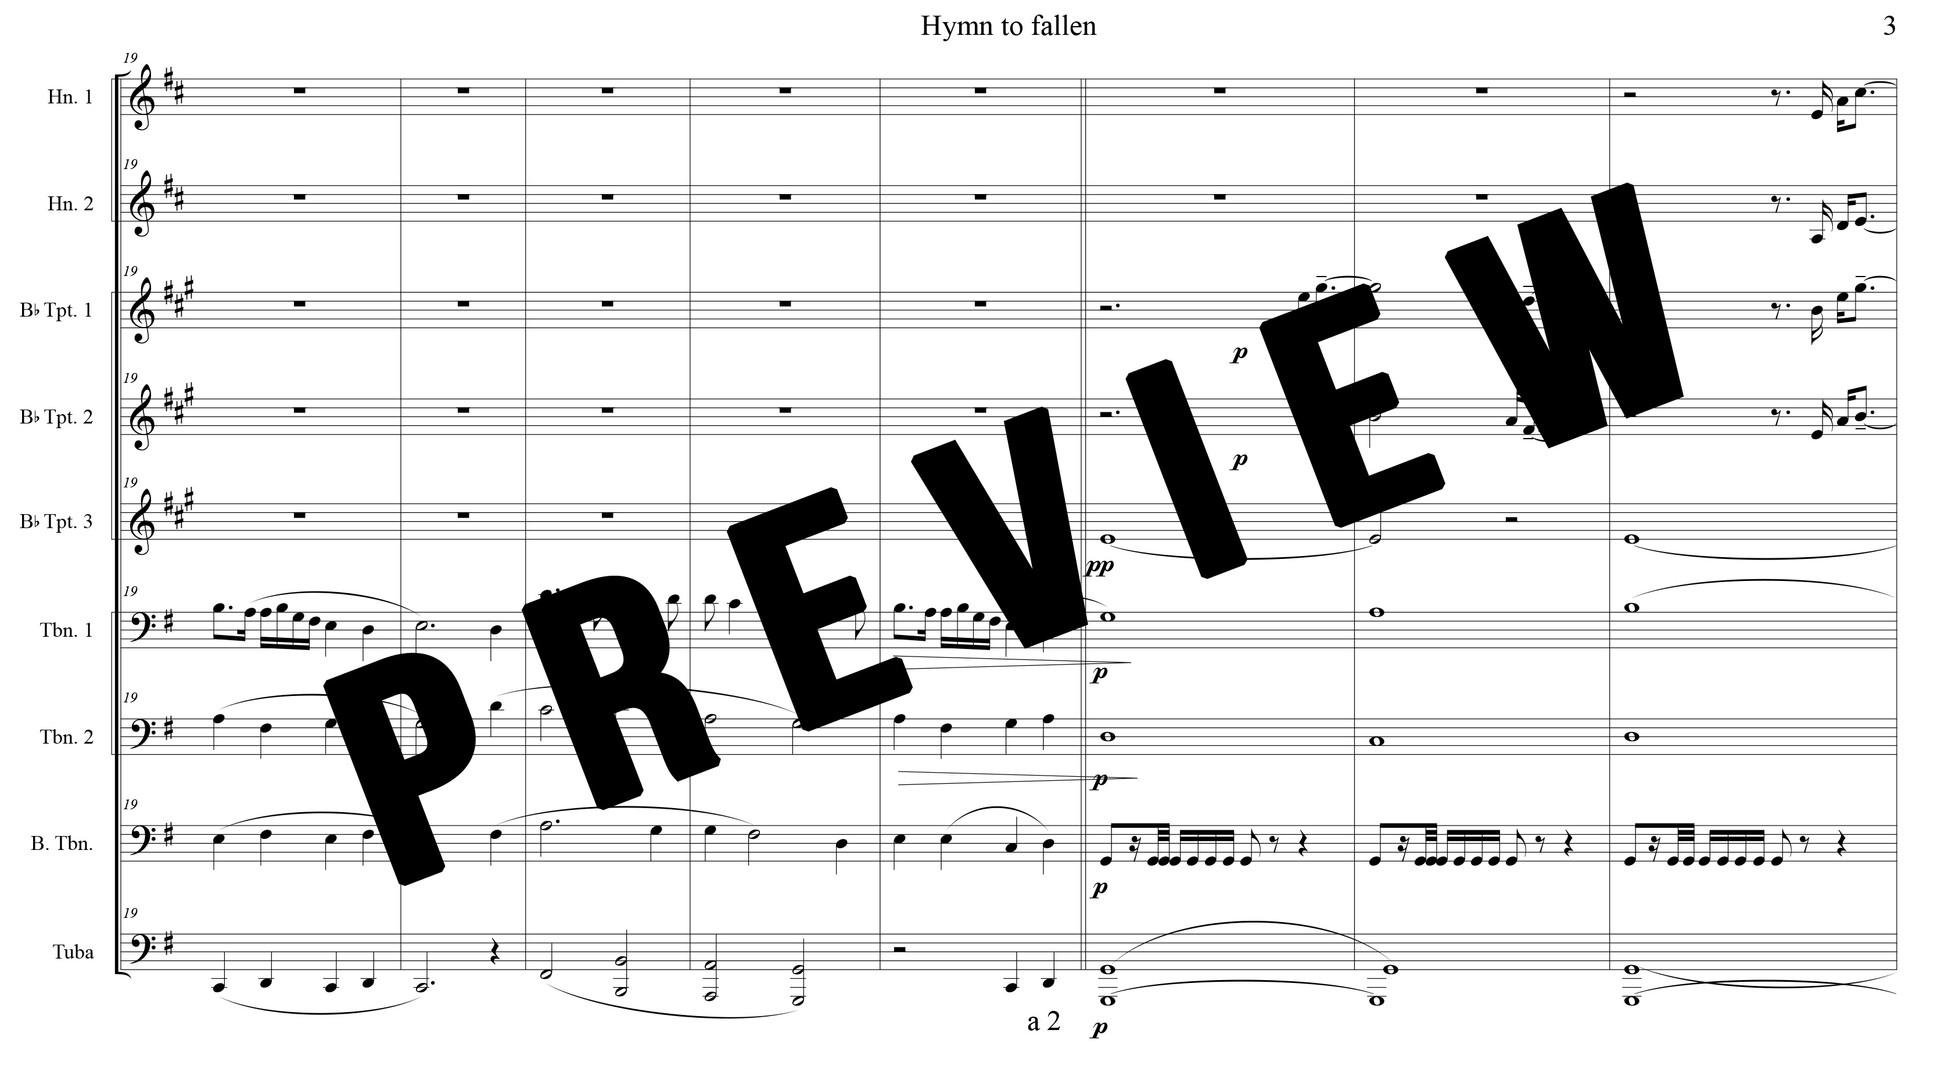 3.Hymn to Fall_BSM-3.jpg